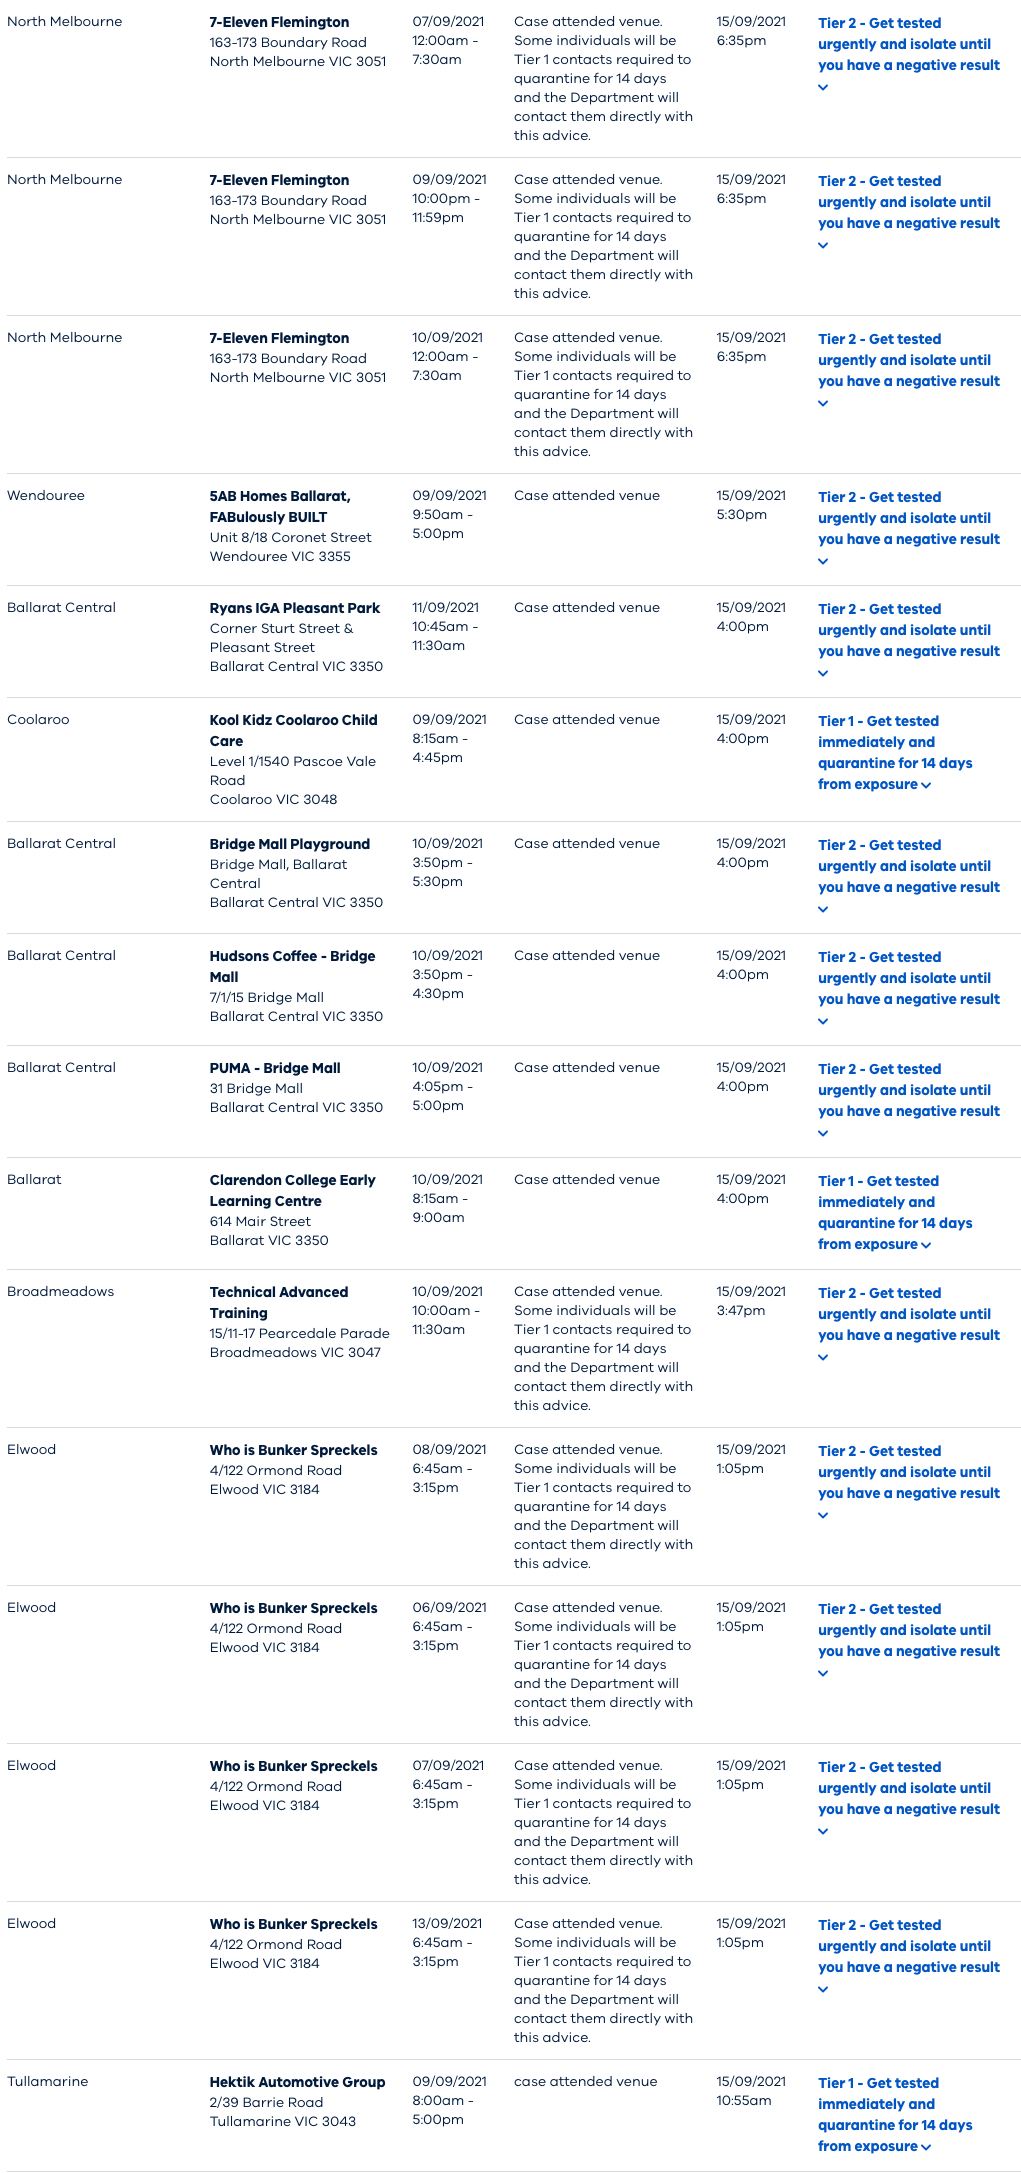 www.coronavirus.vic.gov.au_case-alerts-public-exposure-sites (23).png